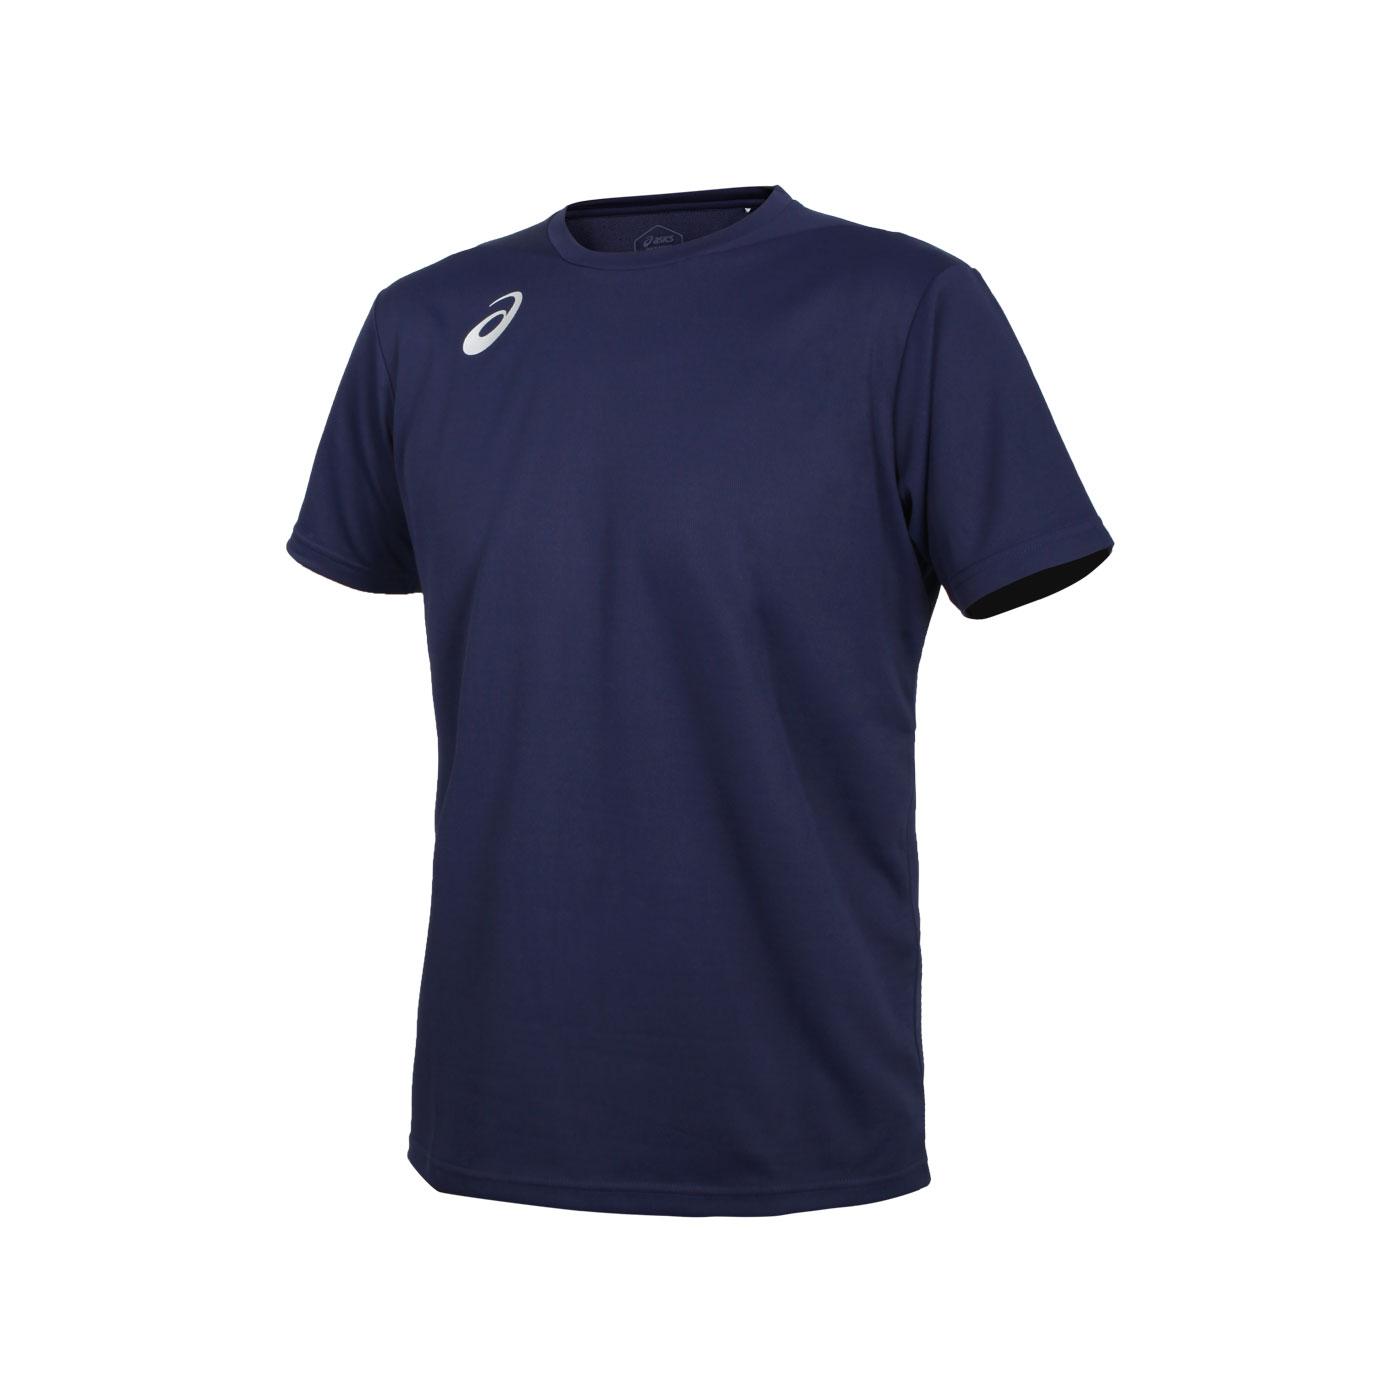 ASICS 男款排羽球短袖T恤 2051A295-400 - 丈青銀